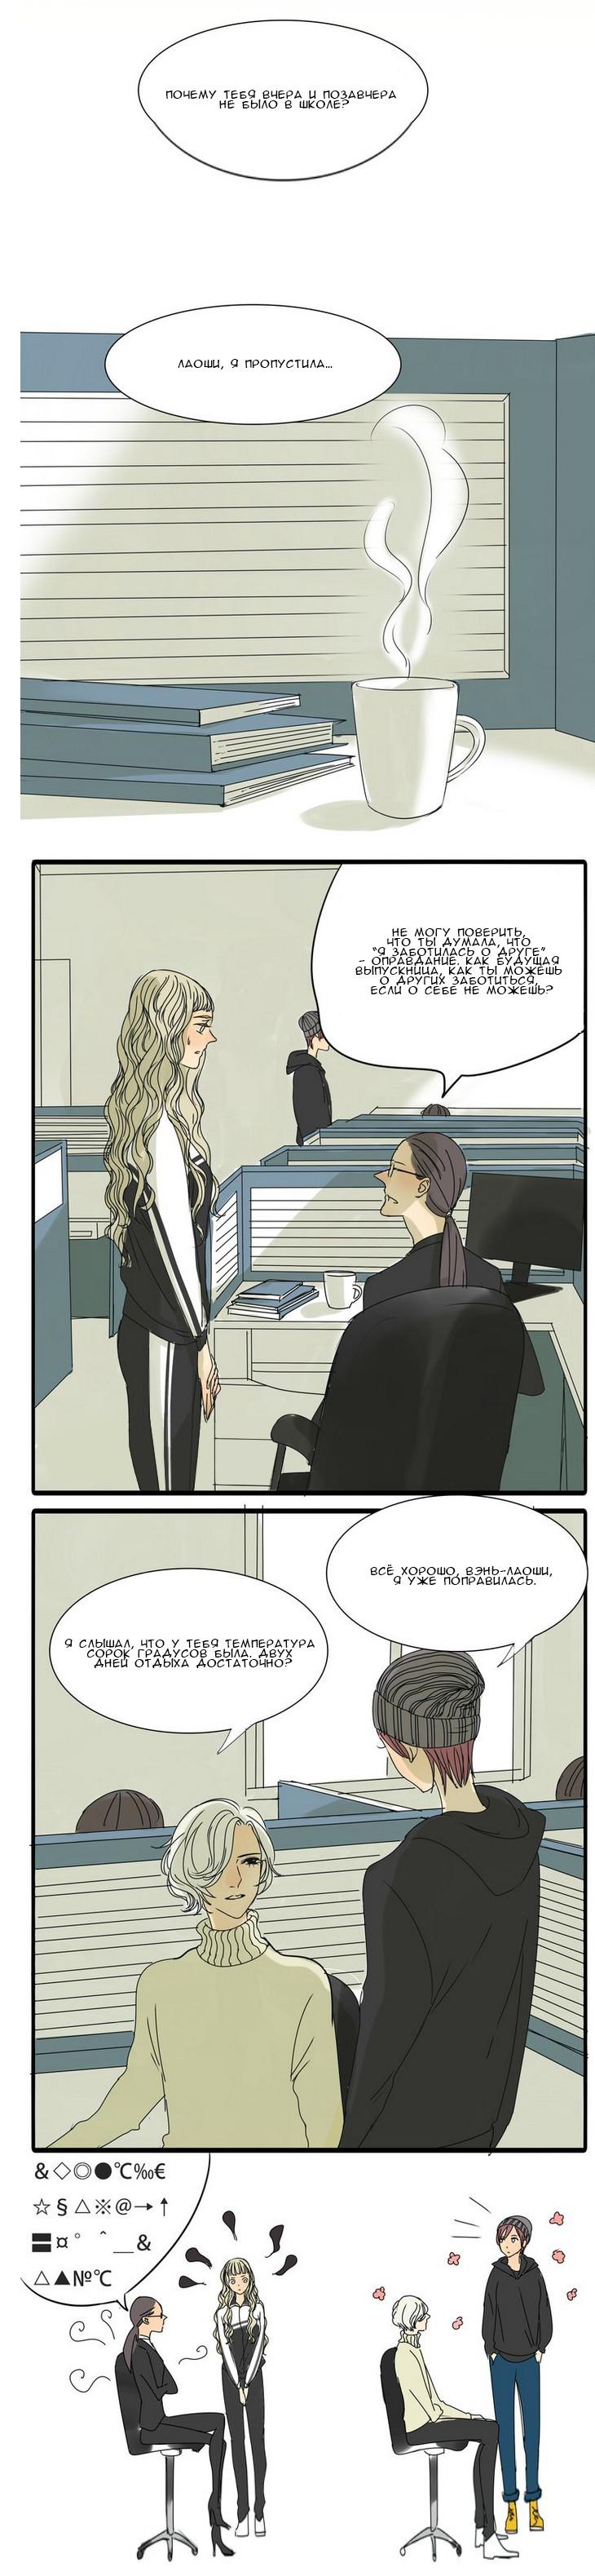 https://r1.ninemanga.com/comics/pic2/20/30804/325265/1495602360495.jpg Page 6